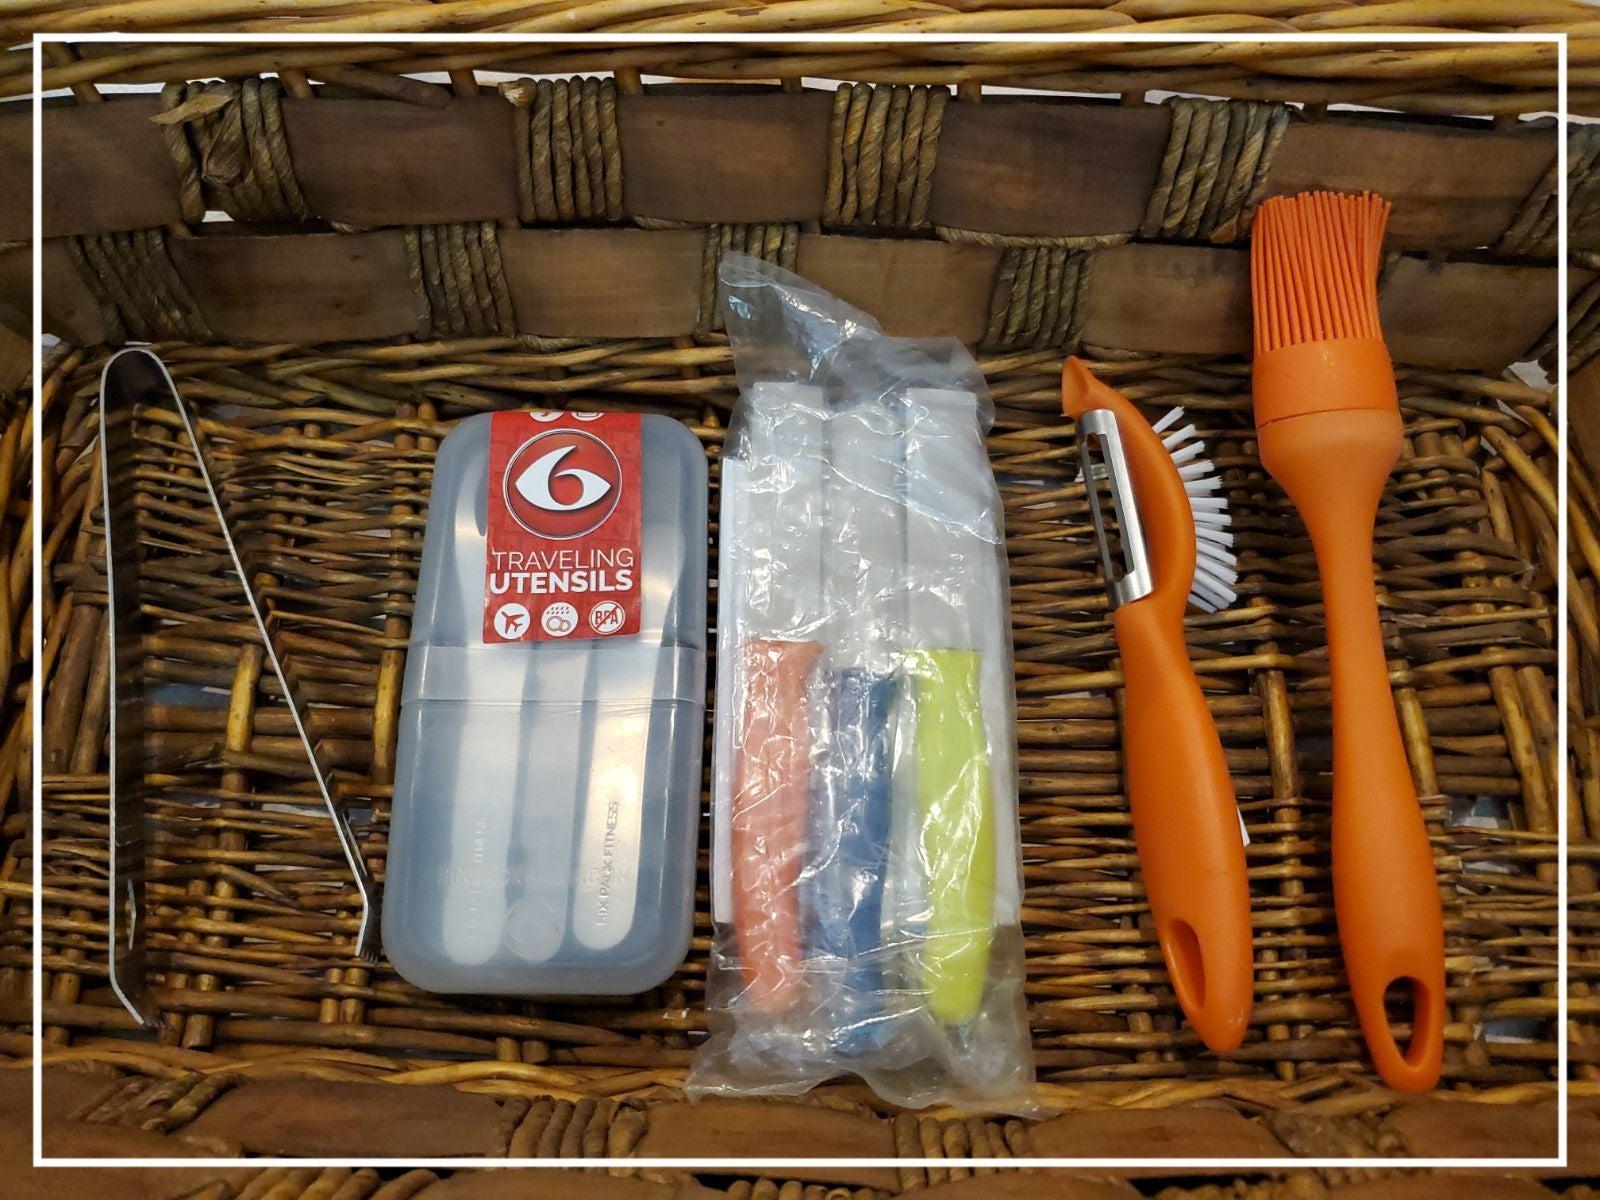 Travel cooking utensils